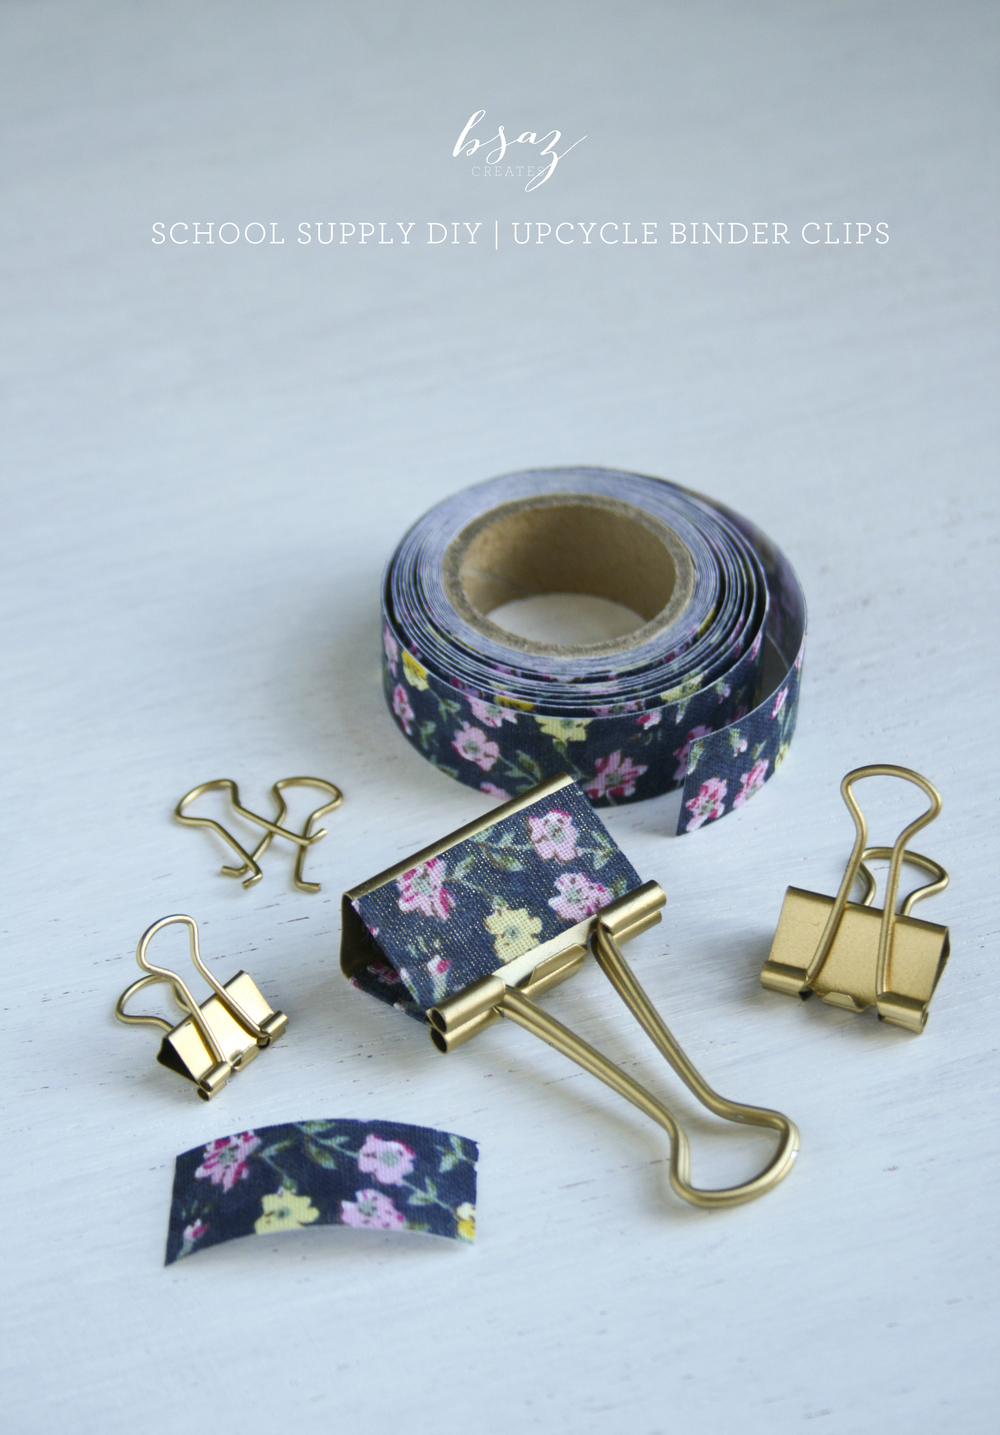 BSAZ CREATES | SCHOOL SUPPLY DIY | UPCYCLE BINDER CLIPS